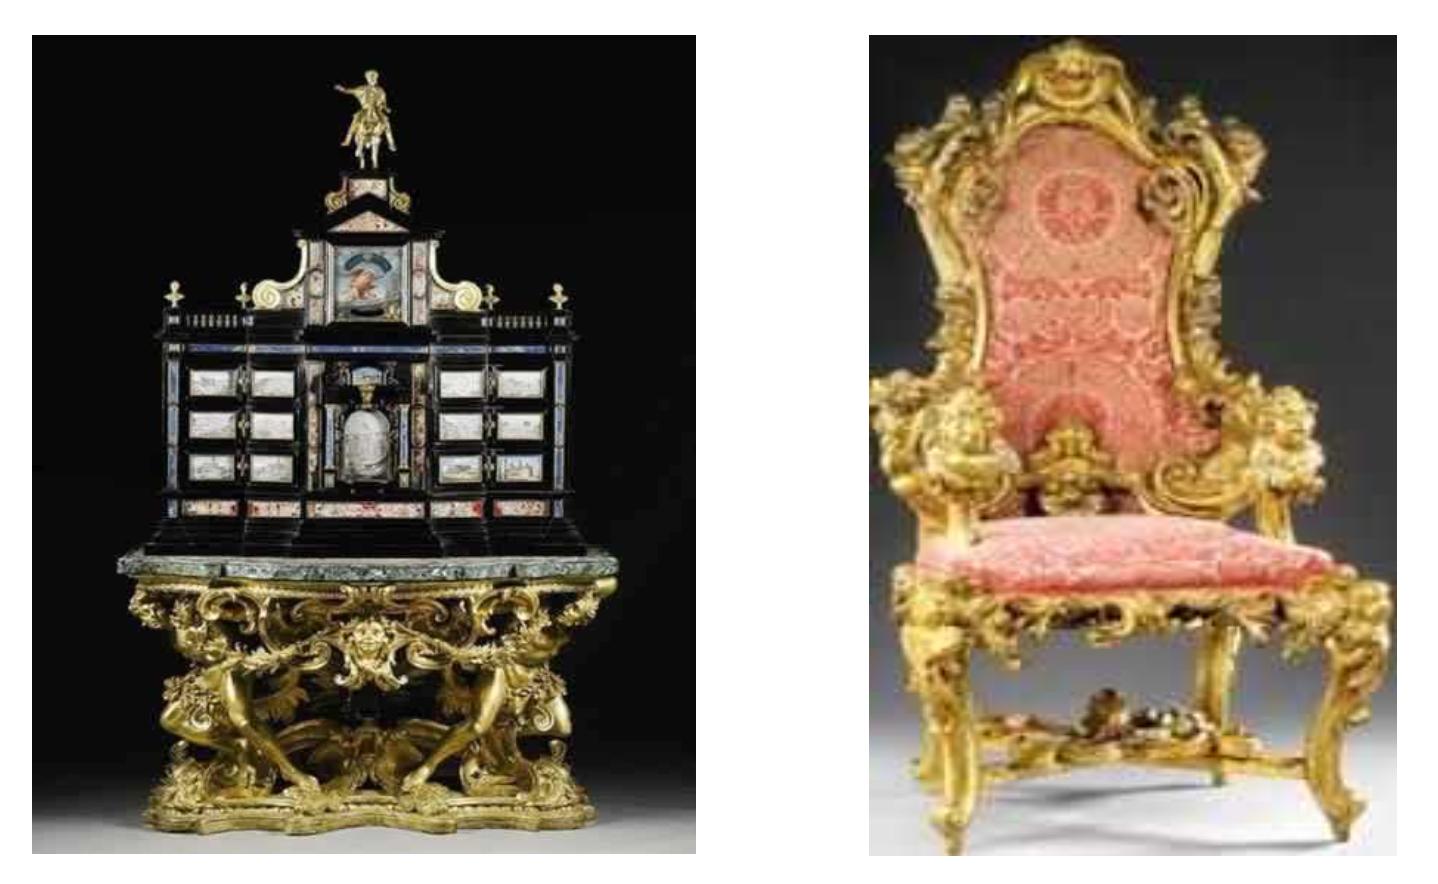 Historia Del Mueble Antig Edades Maestre # Muebles Mudejar